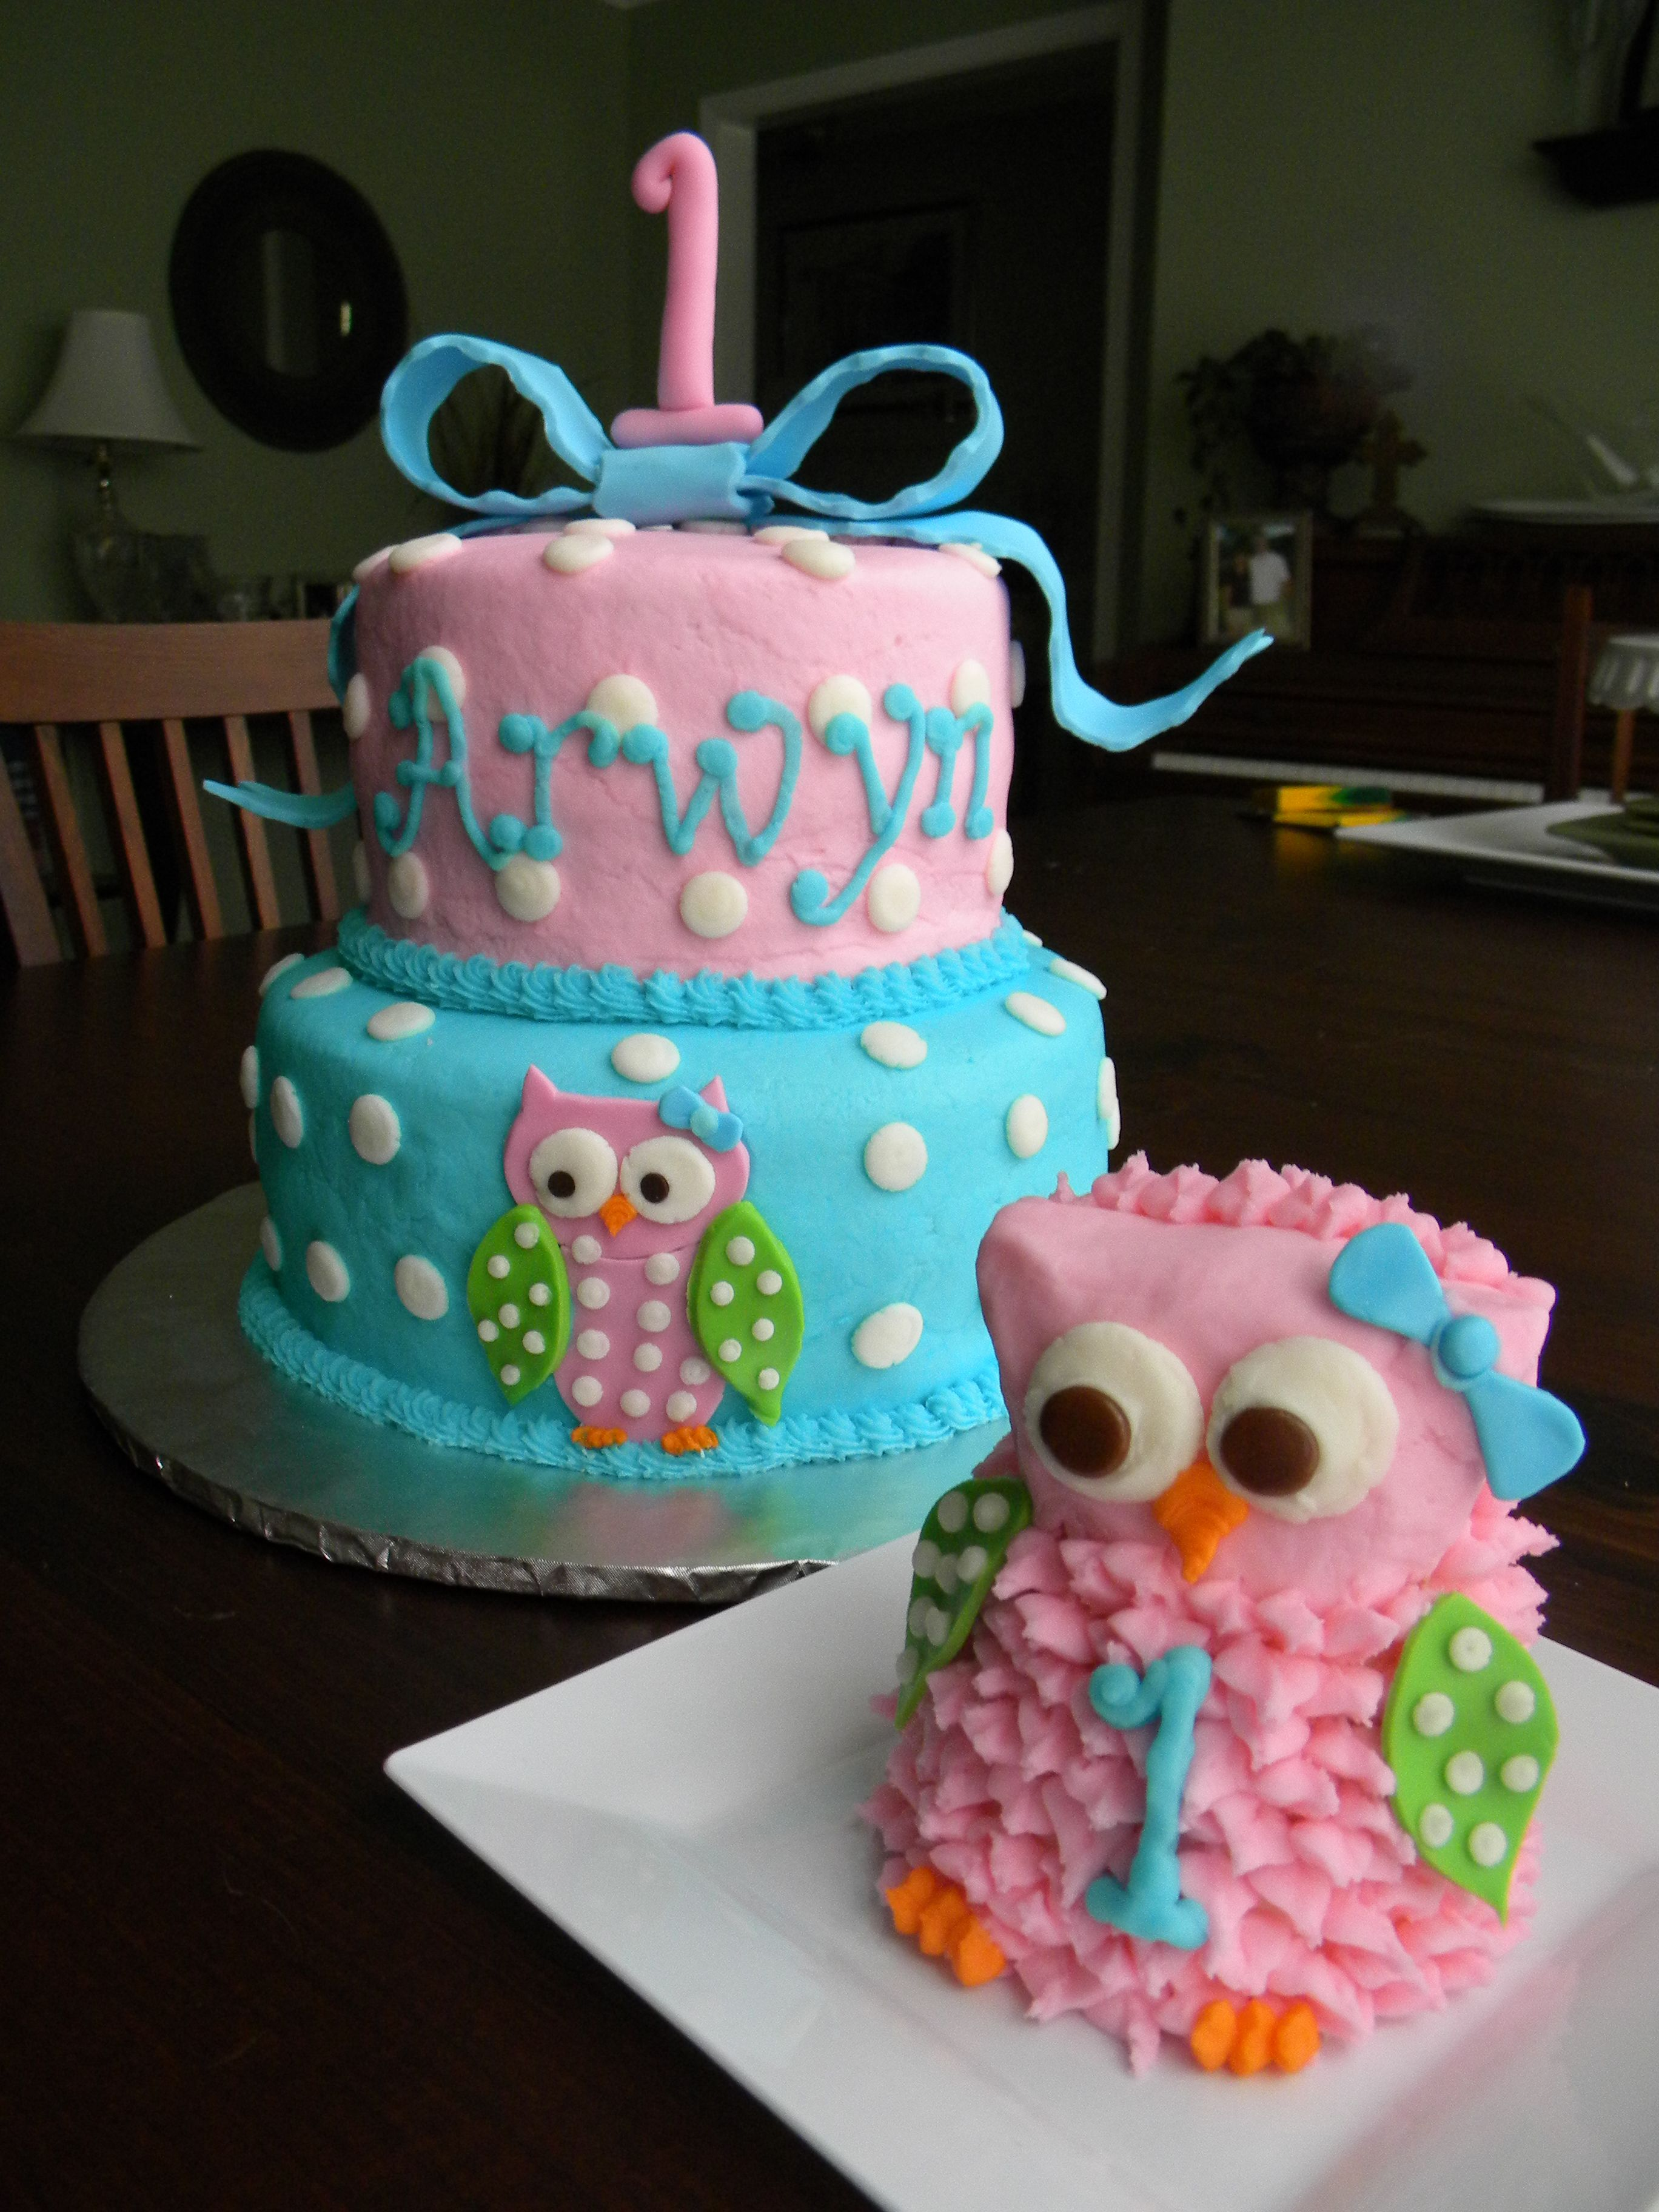 Sensational Owl 1St Birthday Cake And Smash Cake Owl Cake Birthday First Funny Birthday Cards Online Hendilapandamsfinfo